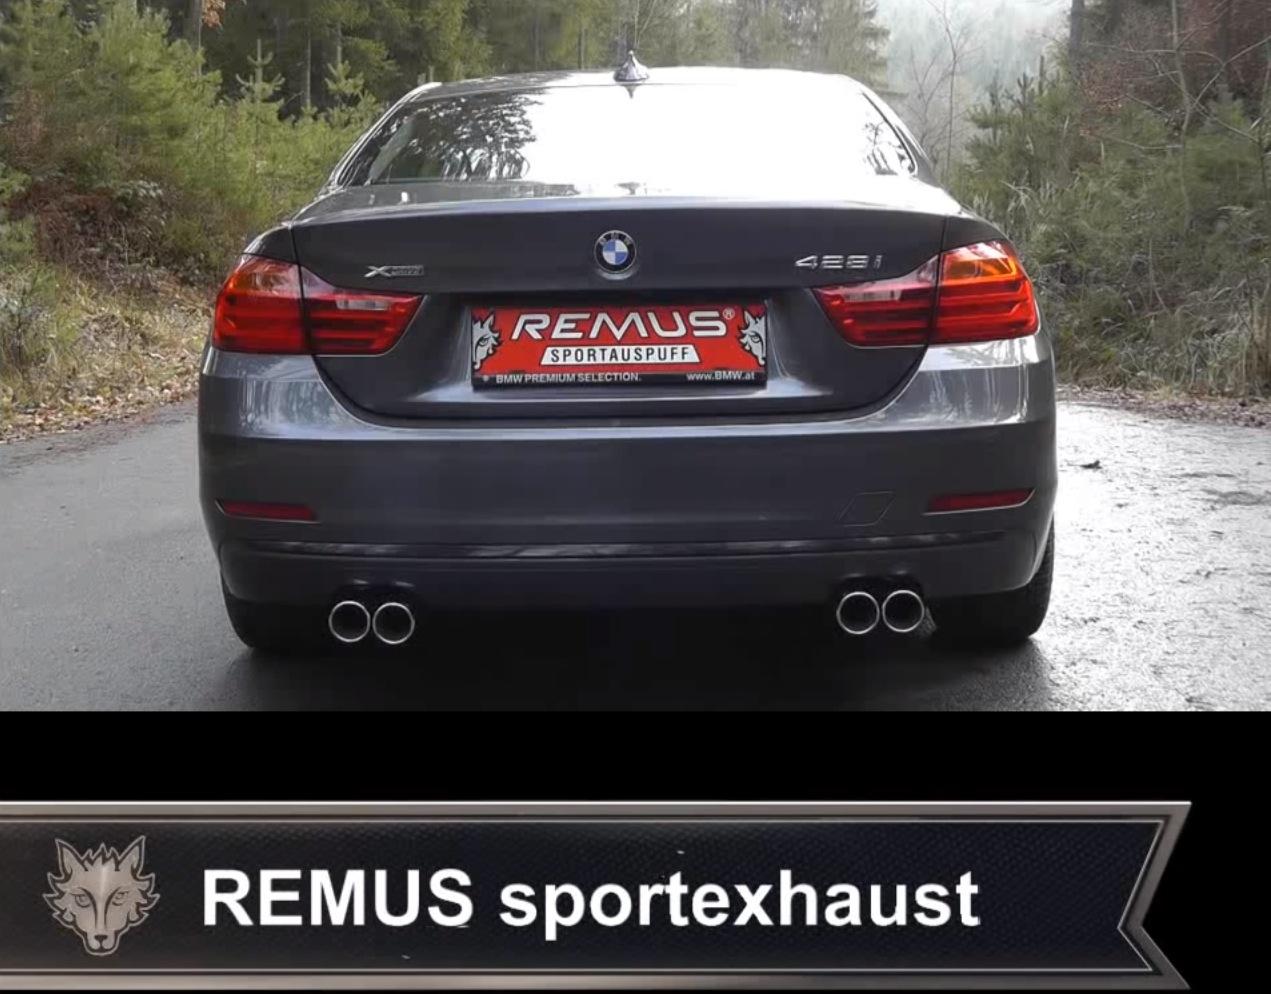 Remus F32 428i Exhaust Sound Video